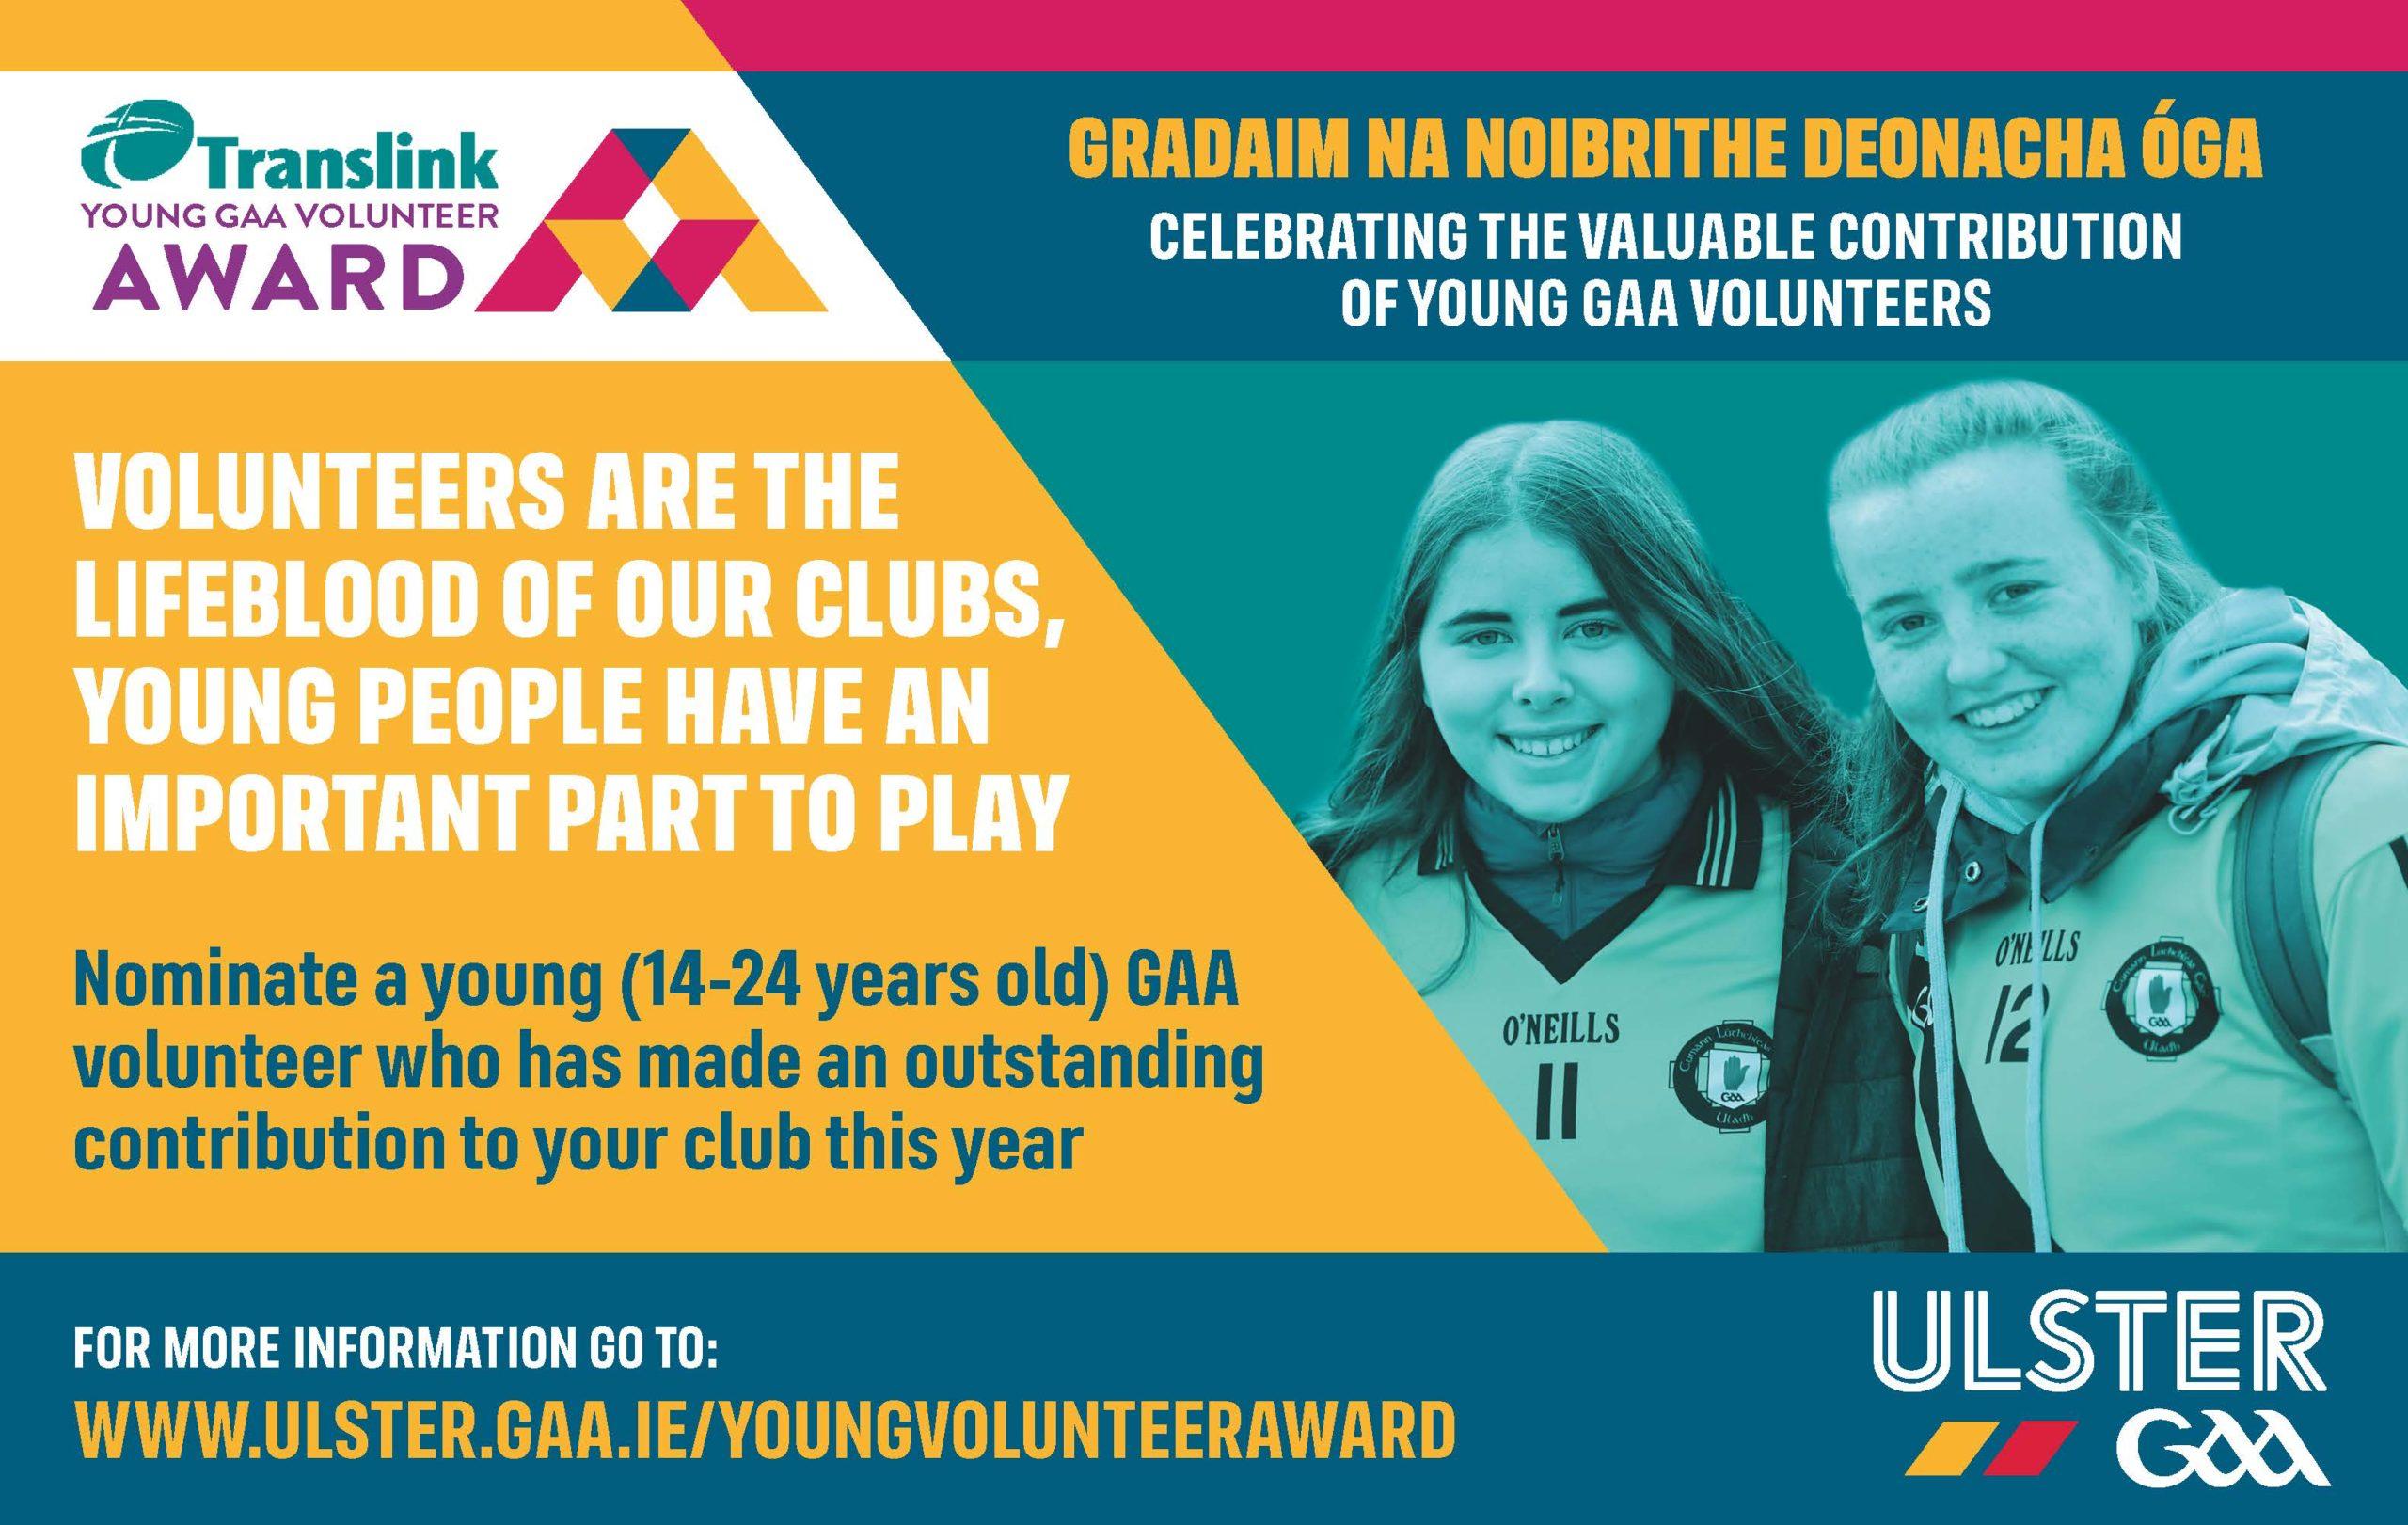 Ulster GAA Young Volunteer Of The Year Award